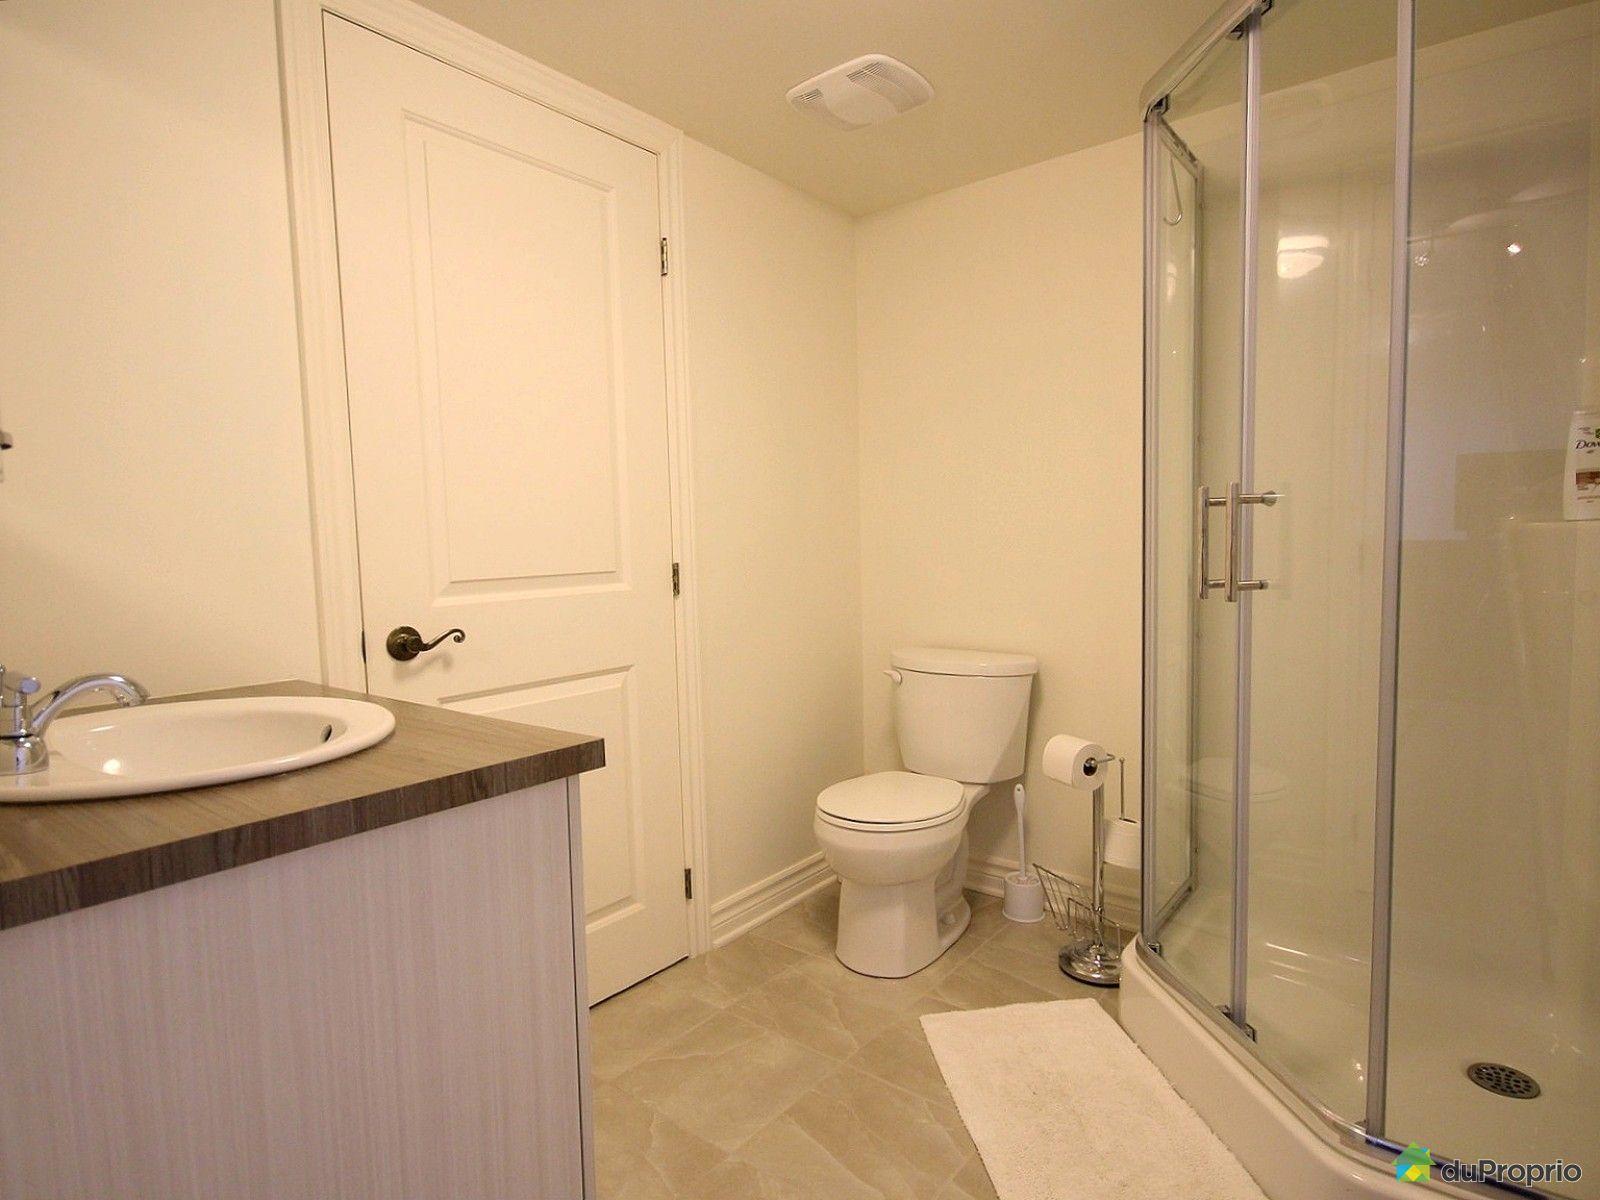 Jumel vendu chambly immobilier qu bec duproprio 529710 for Plomberie sous sol salle de bain